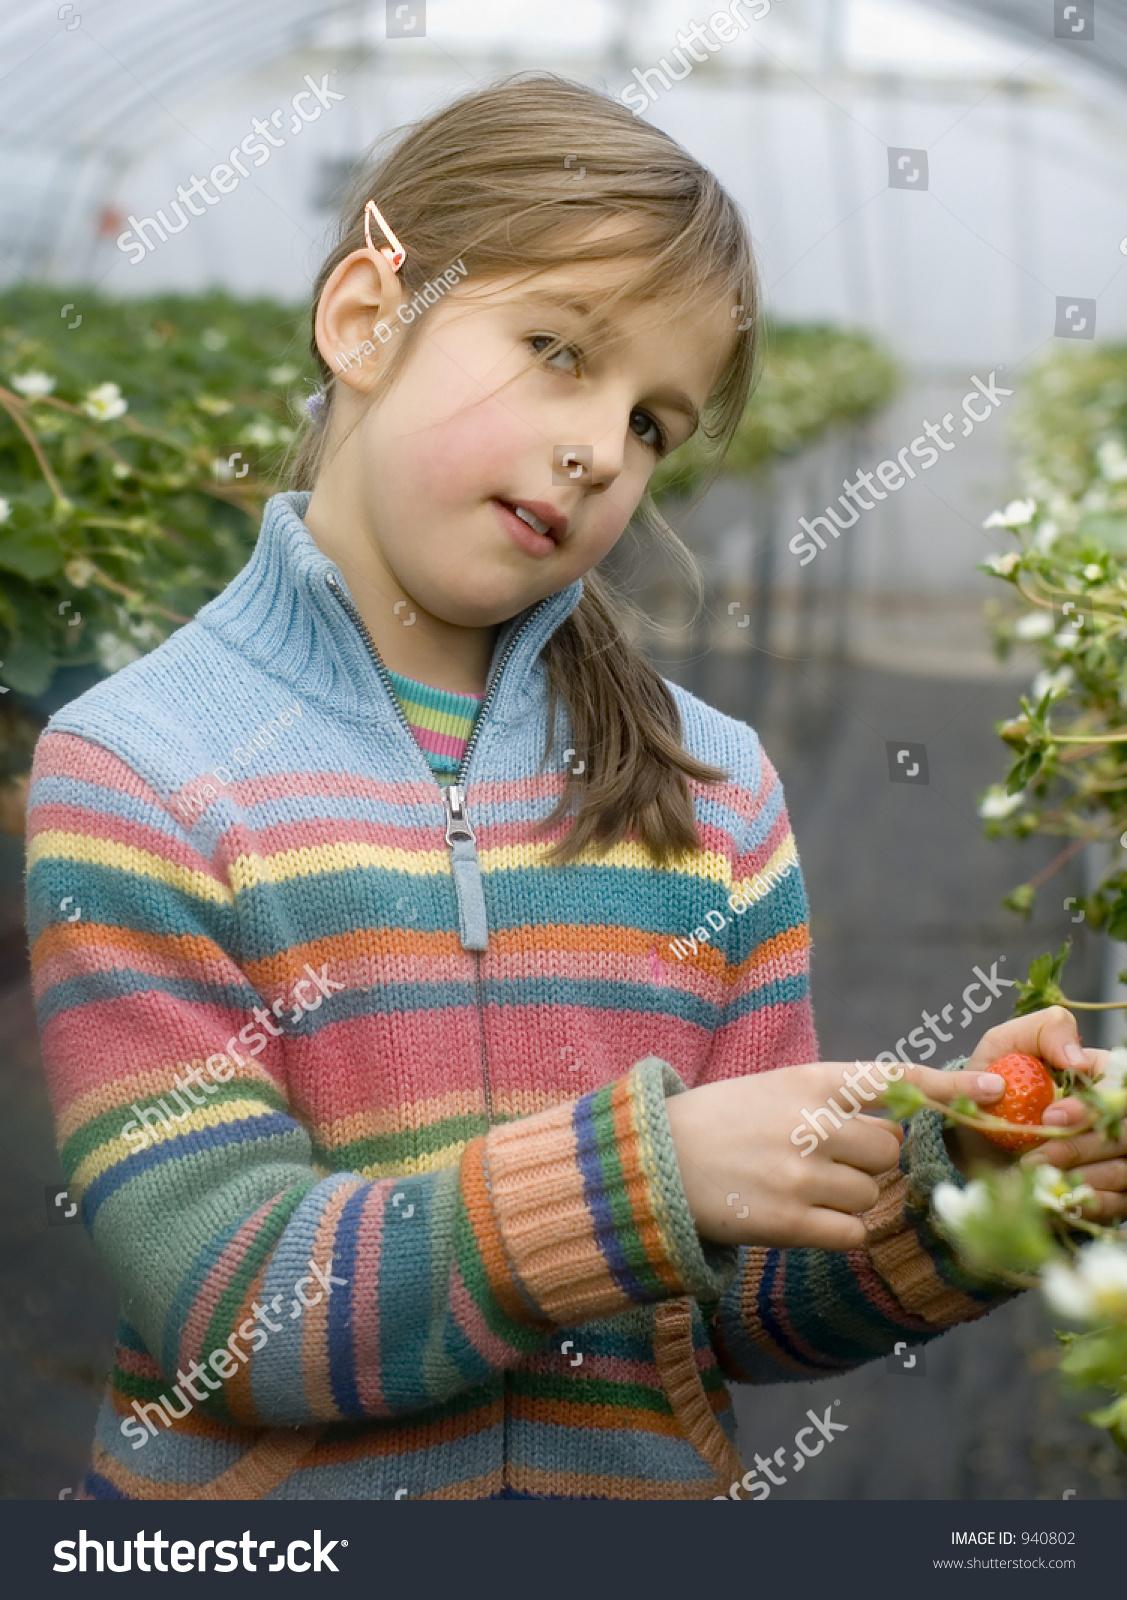 Myfruitspreteenforum: Fruits Preteen Pics Beautiful Preteen Girl Collecting